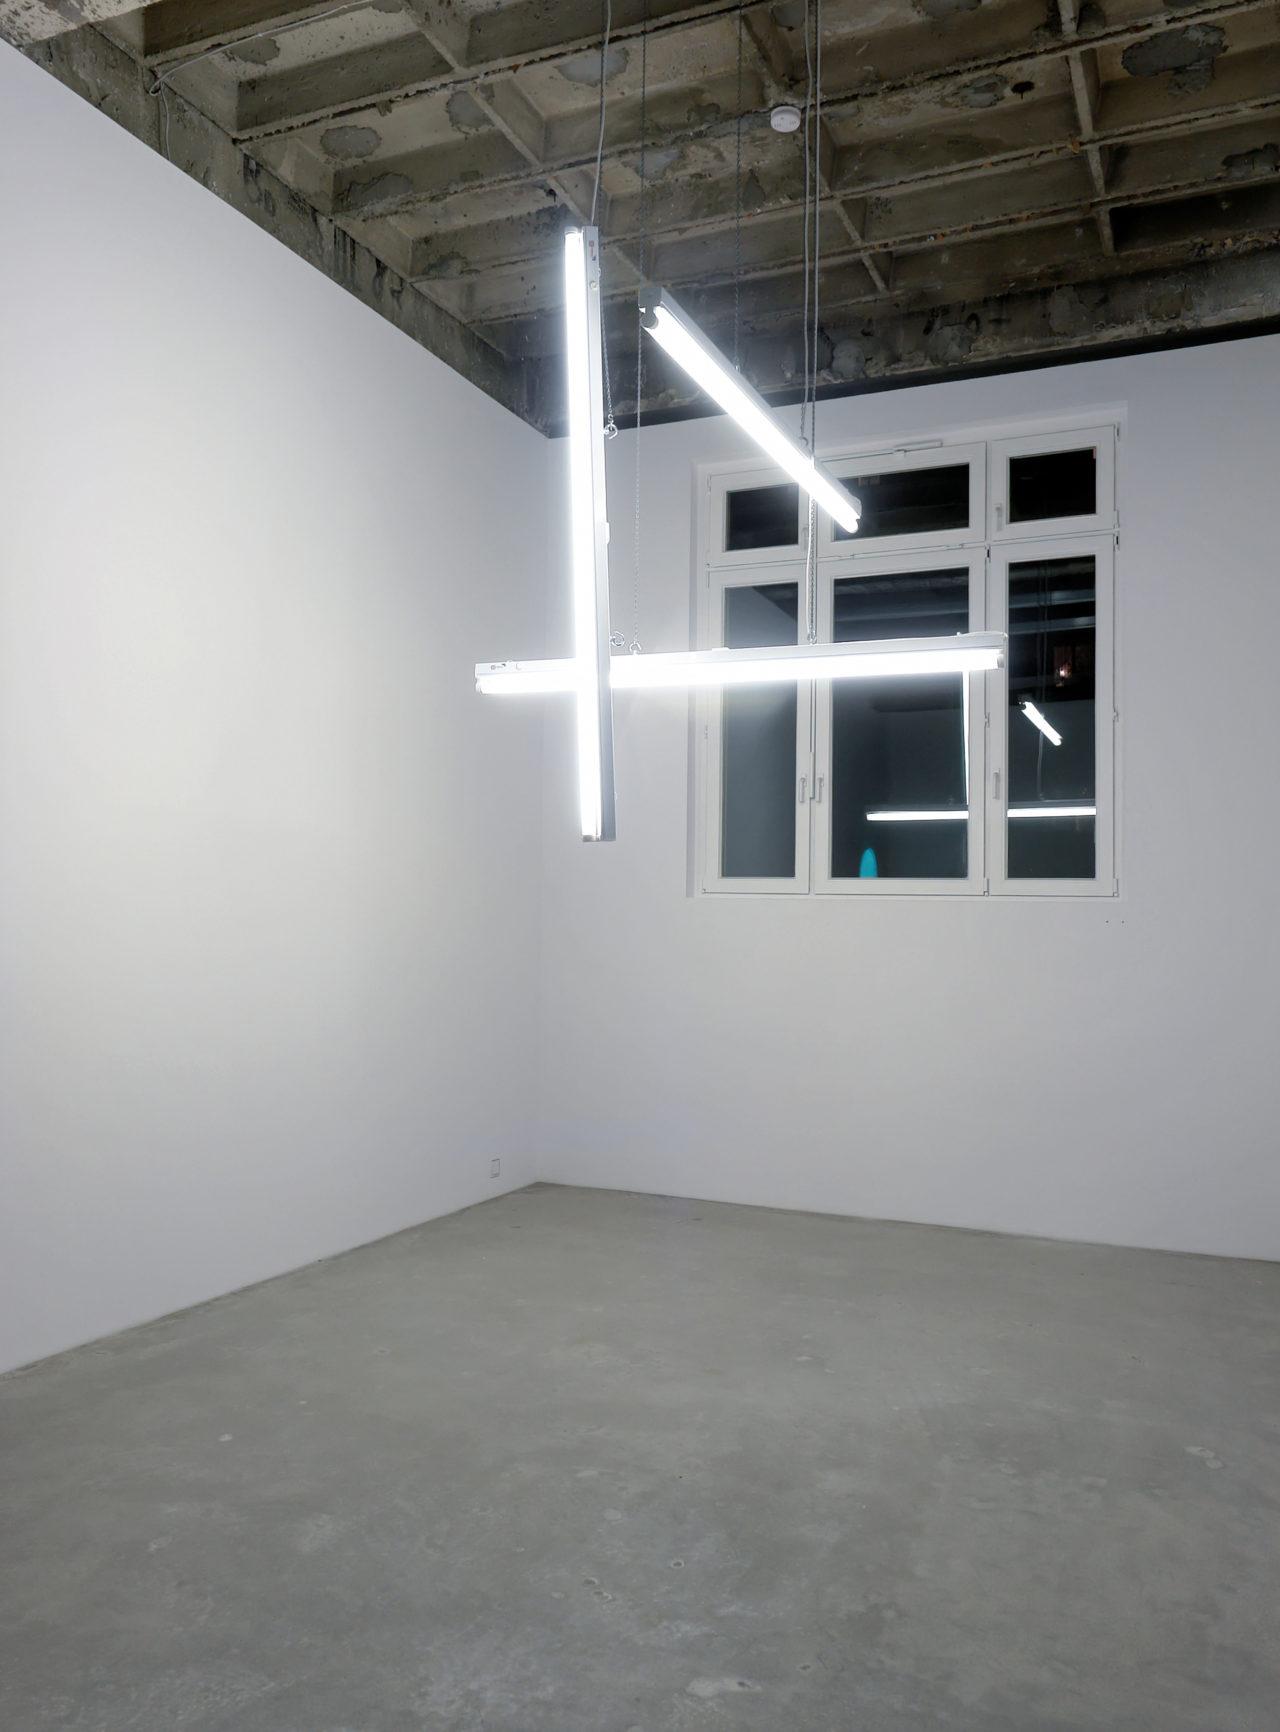 Martin Boyce, untitled (after Rietveld) (1999)